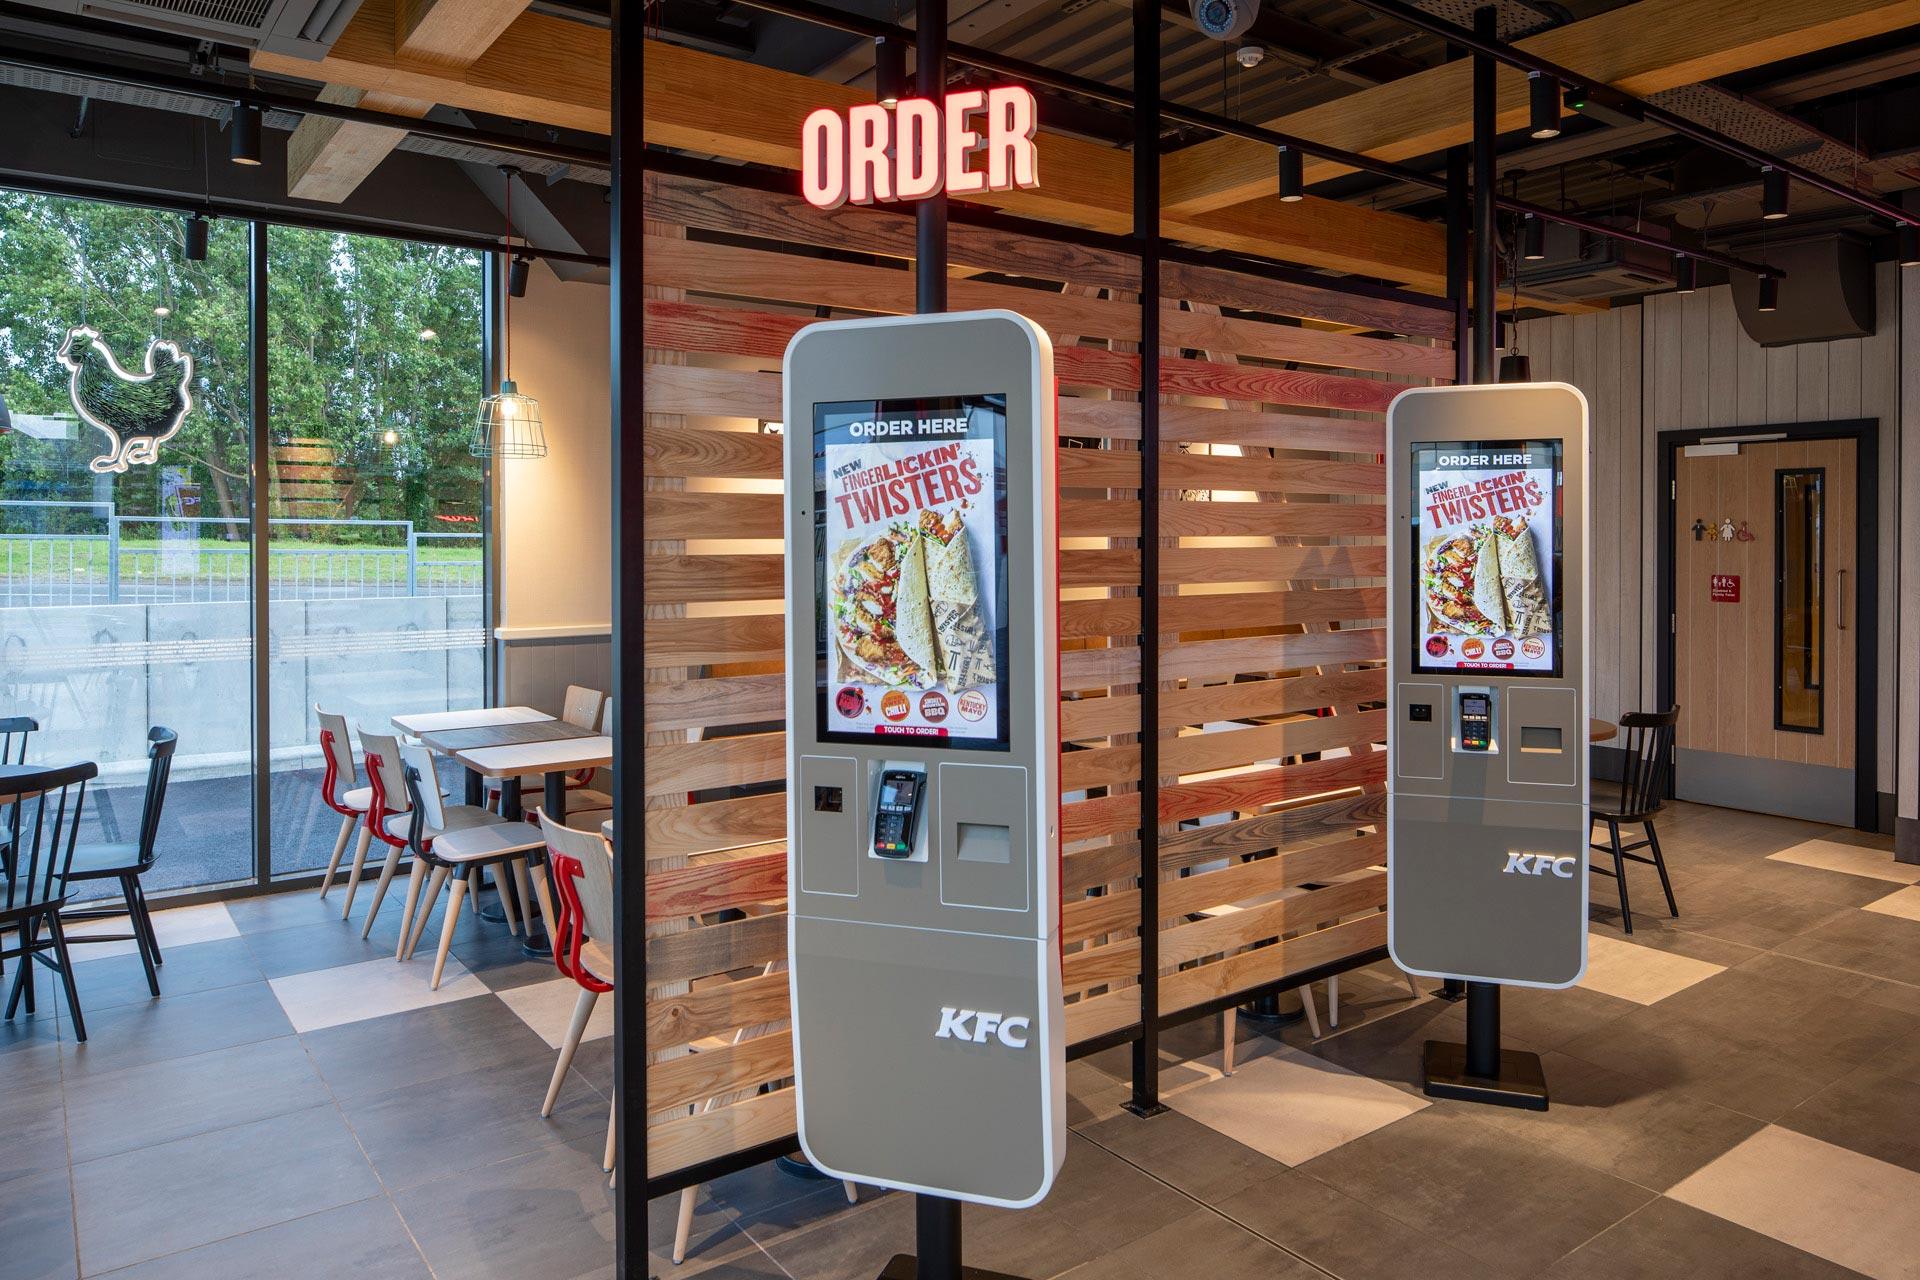 KFC Garston, Liverpool - Modular Restaurant building - Internal ordering kiosks